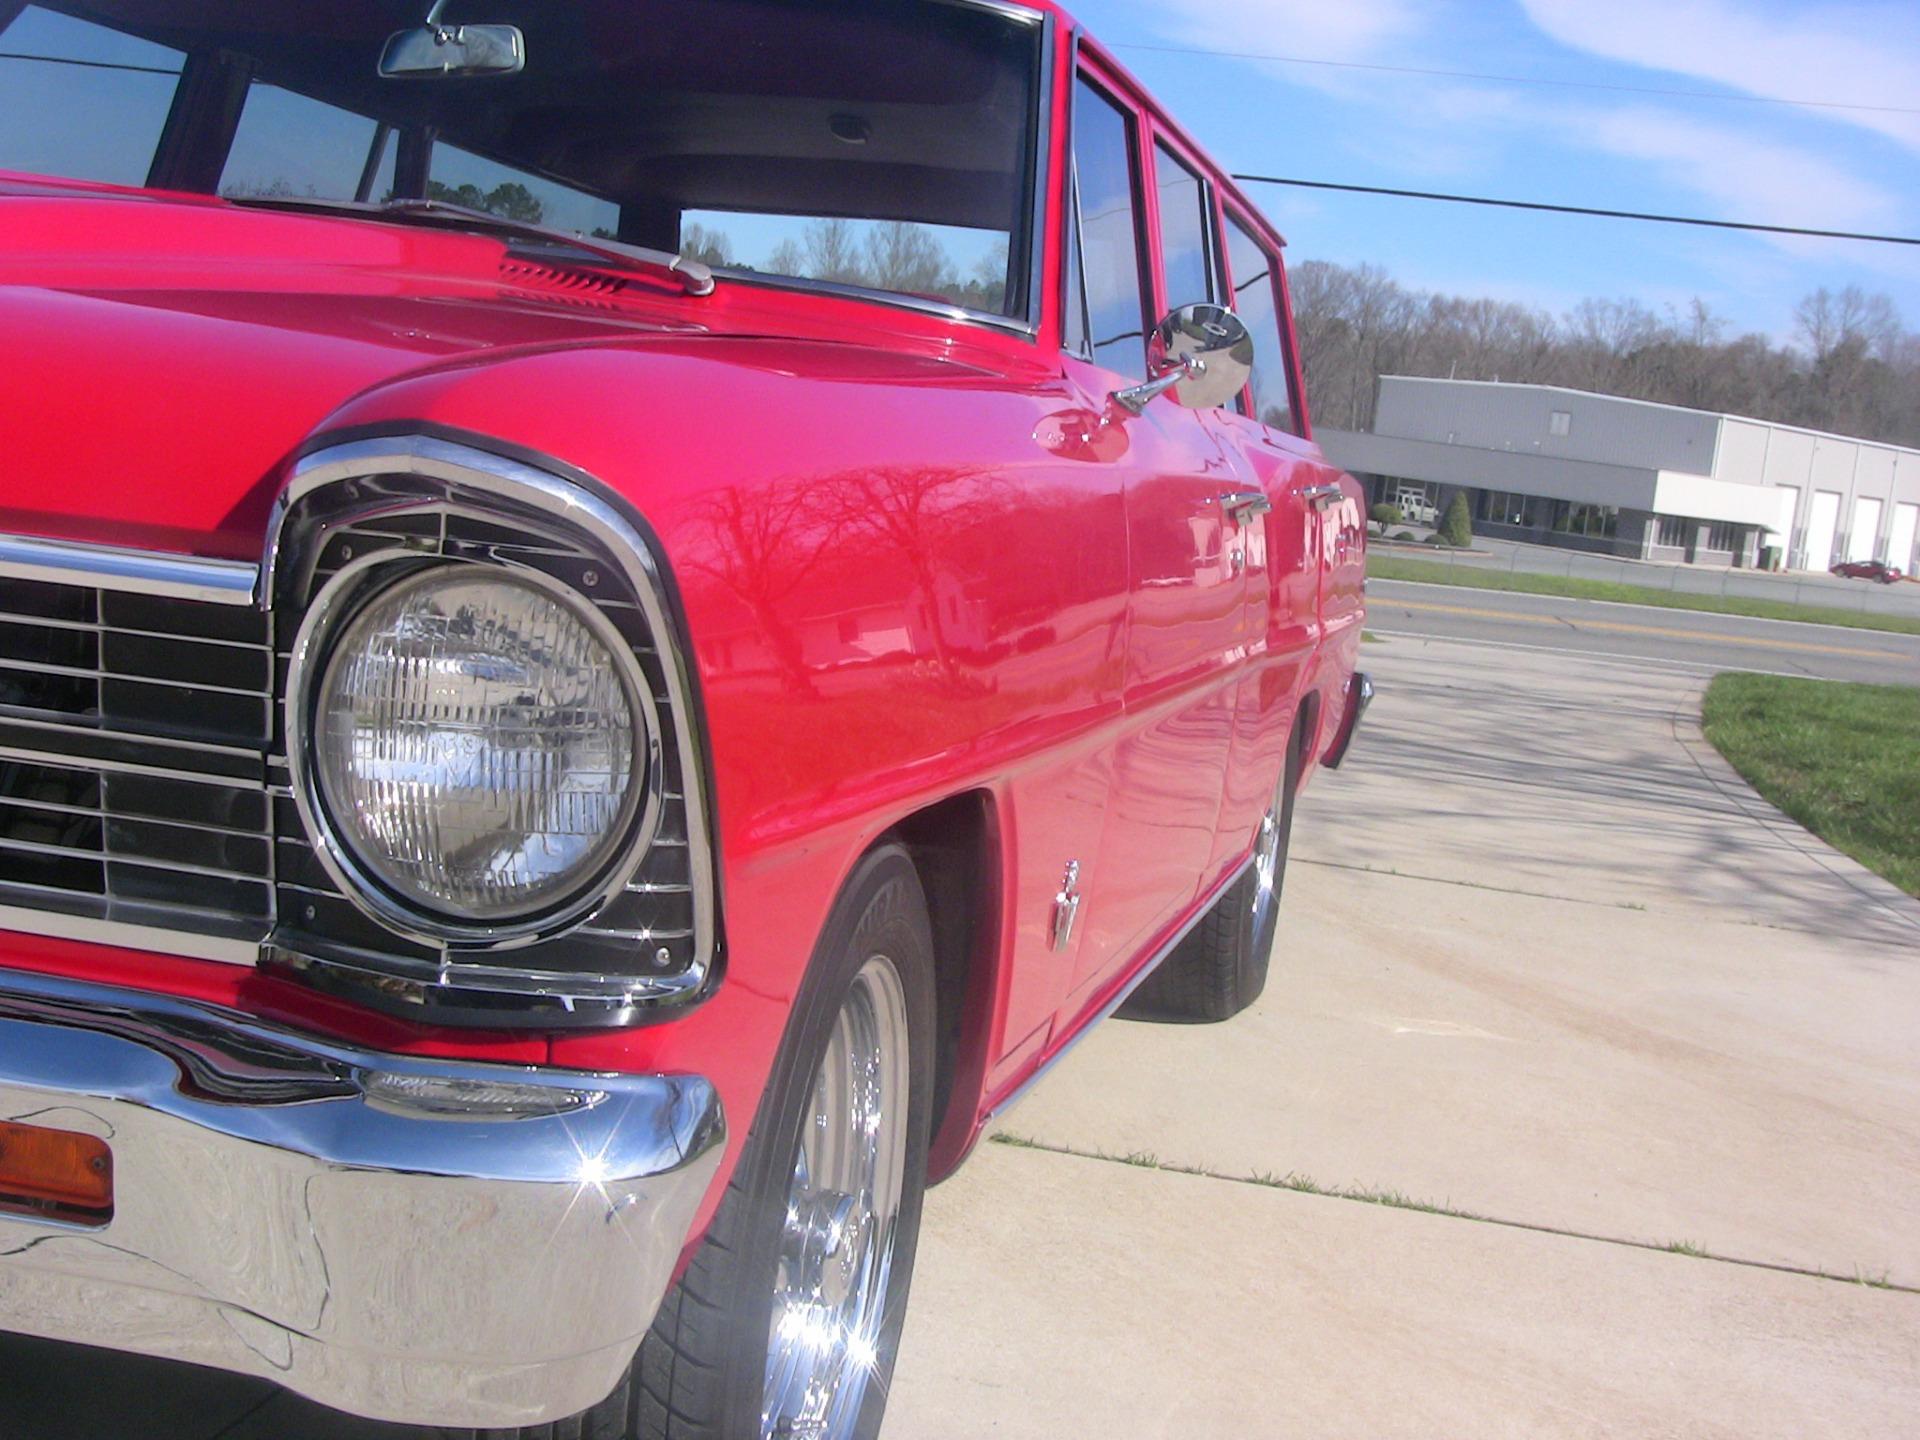 Used 1967 Chevrolet Nova II Station Wagon